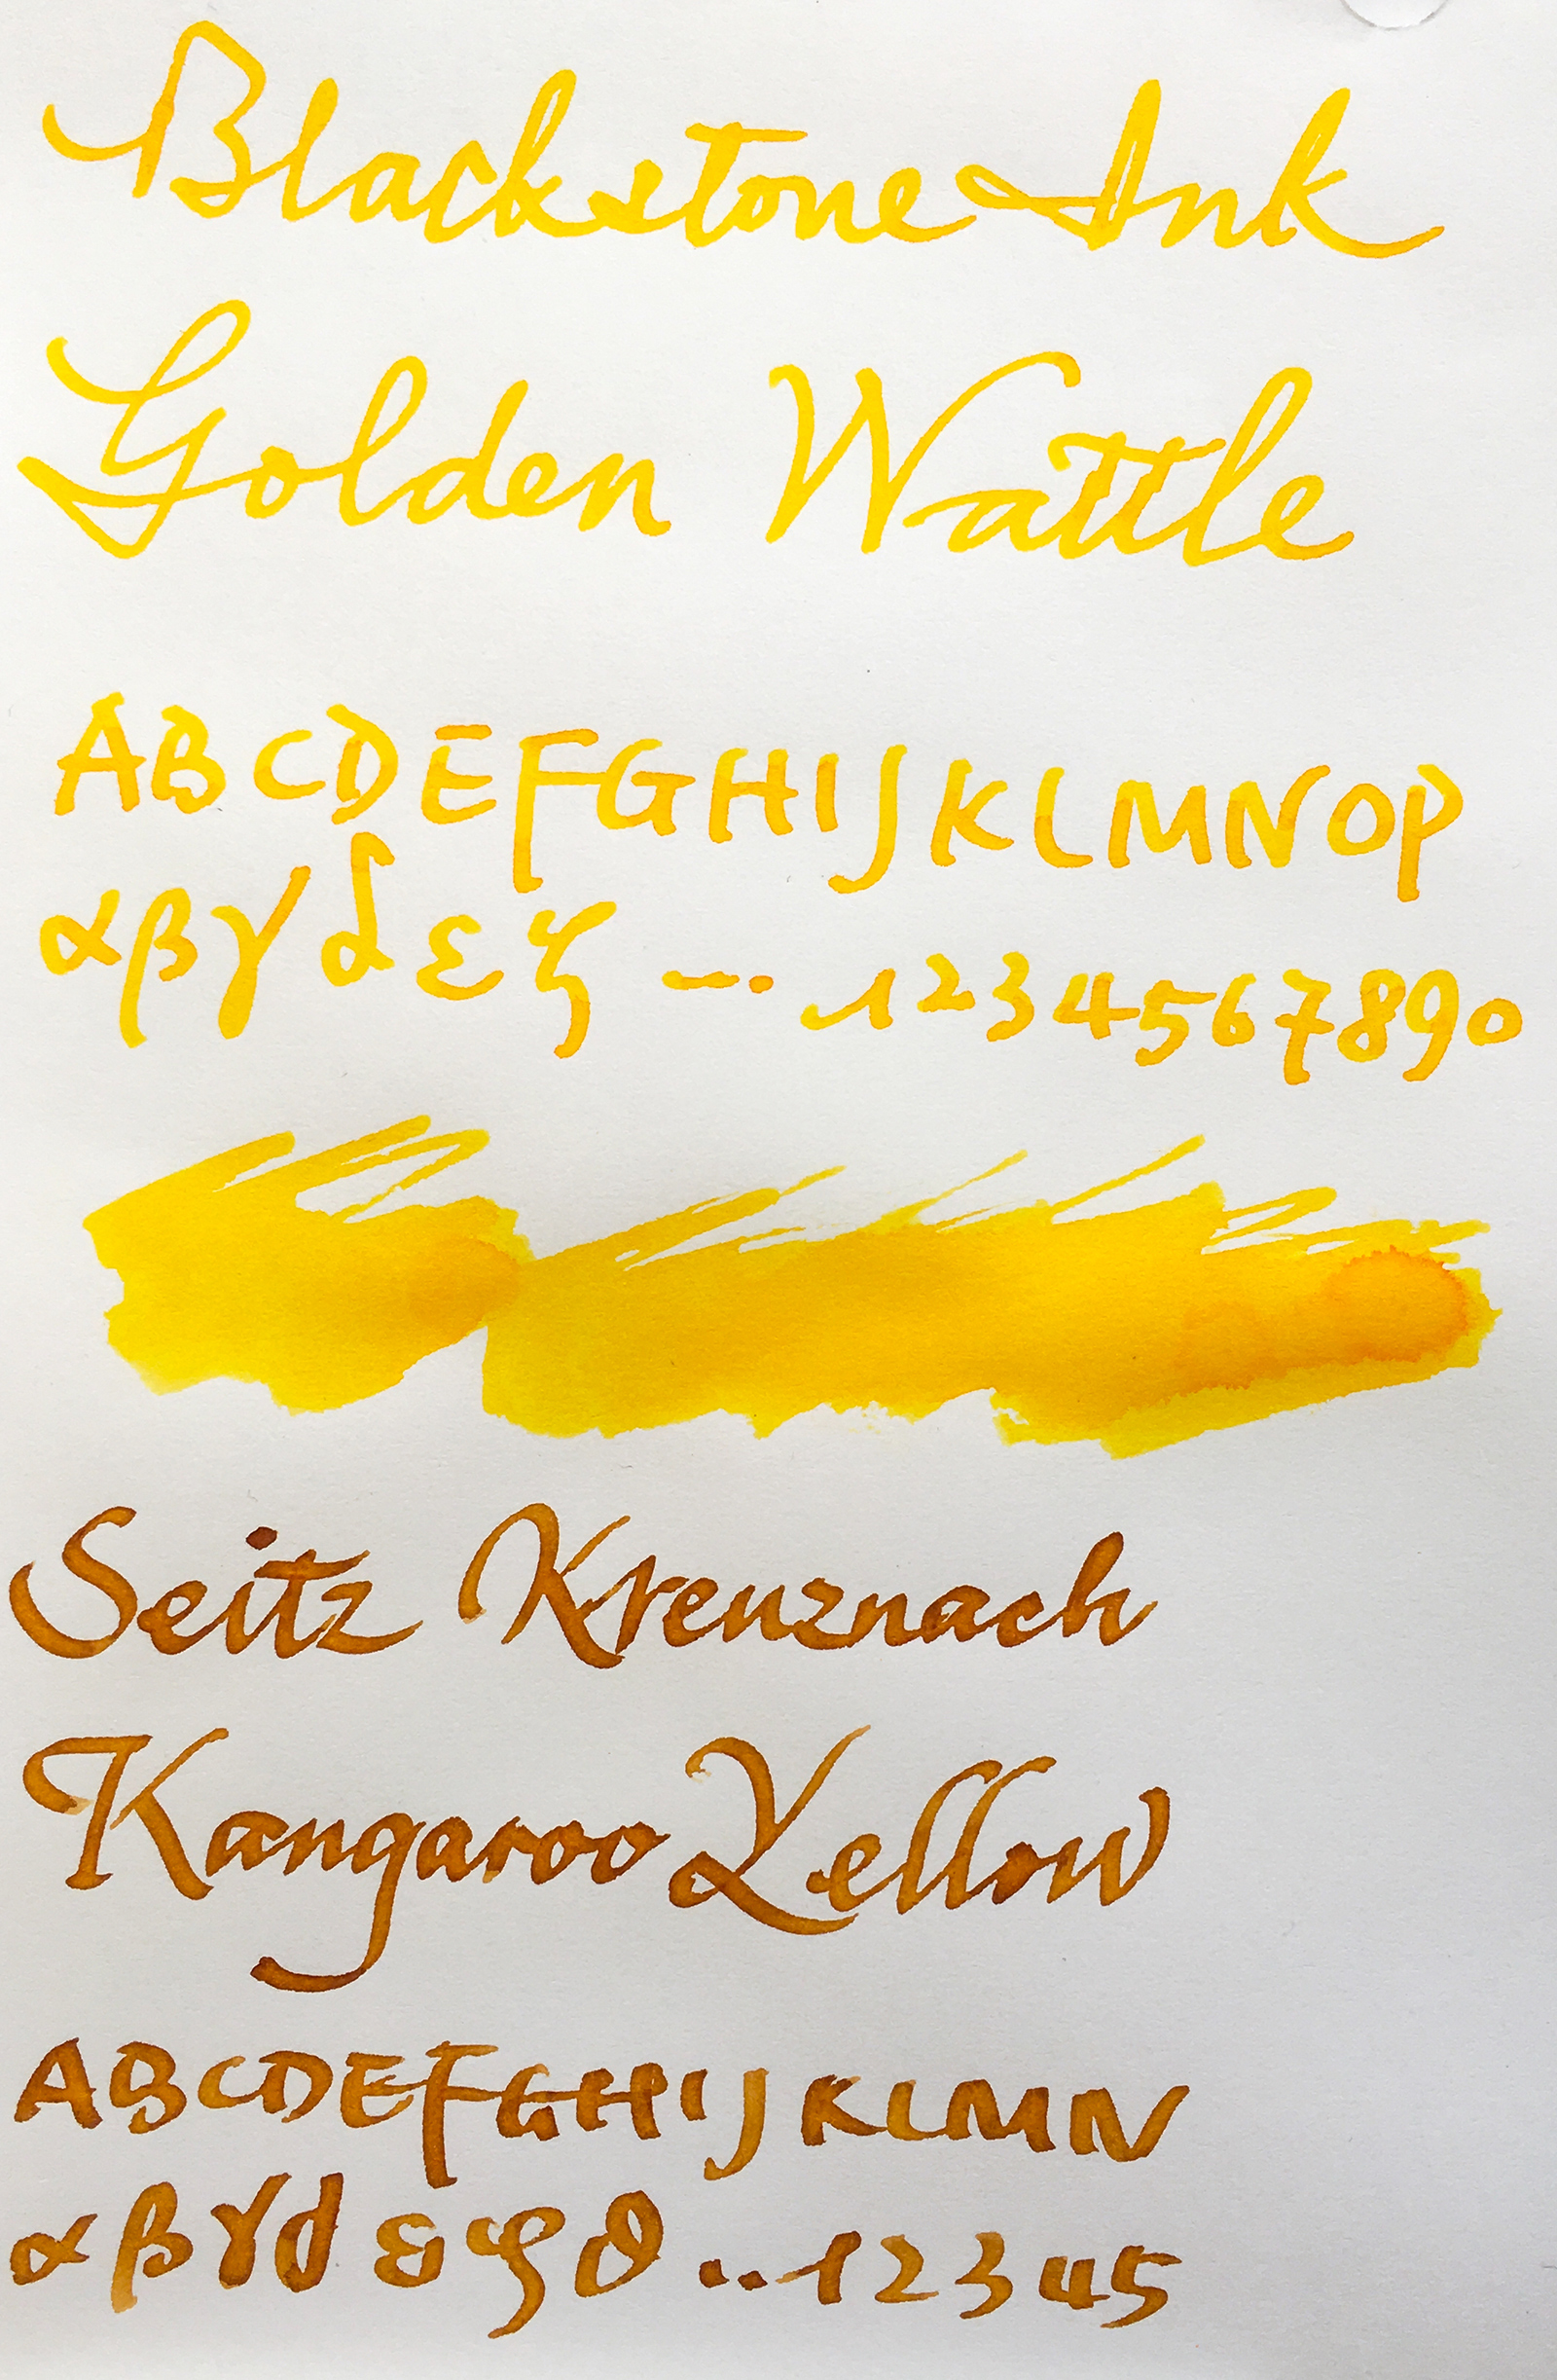 fpn_1477596906__goldenwattle-comp2.jpg